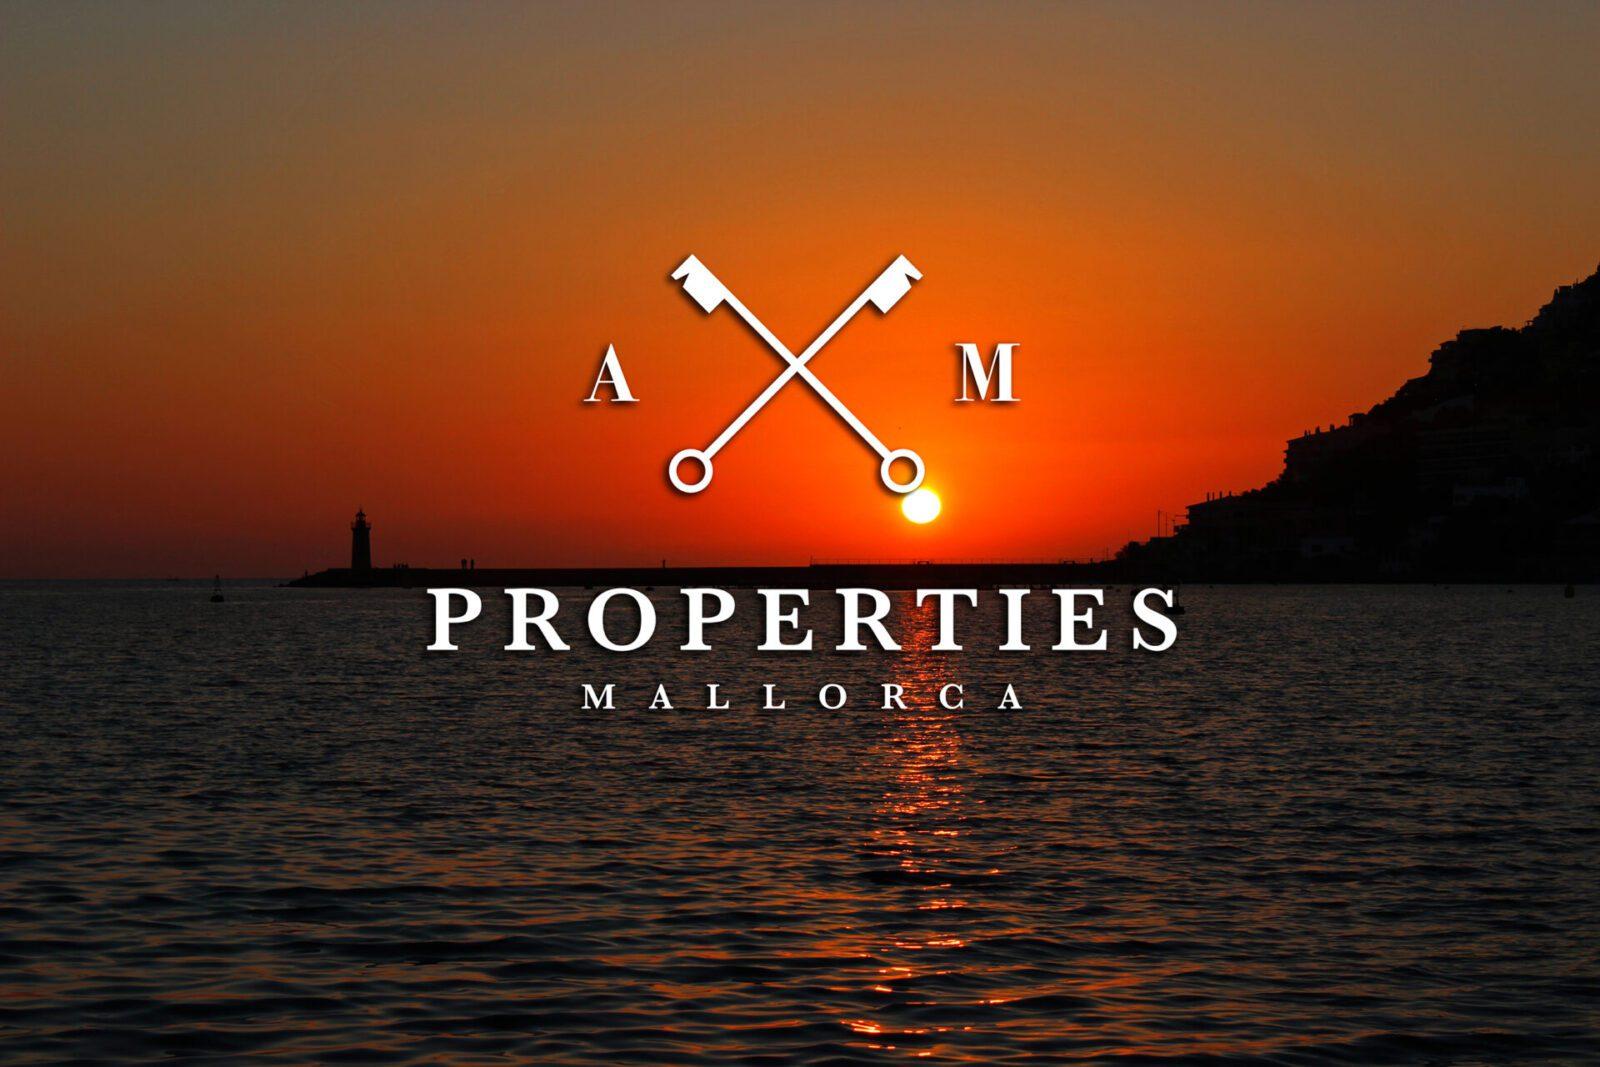 Inmobiliaria en mallorca comprar una casa en andratx - Propiedades en mallorca ...